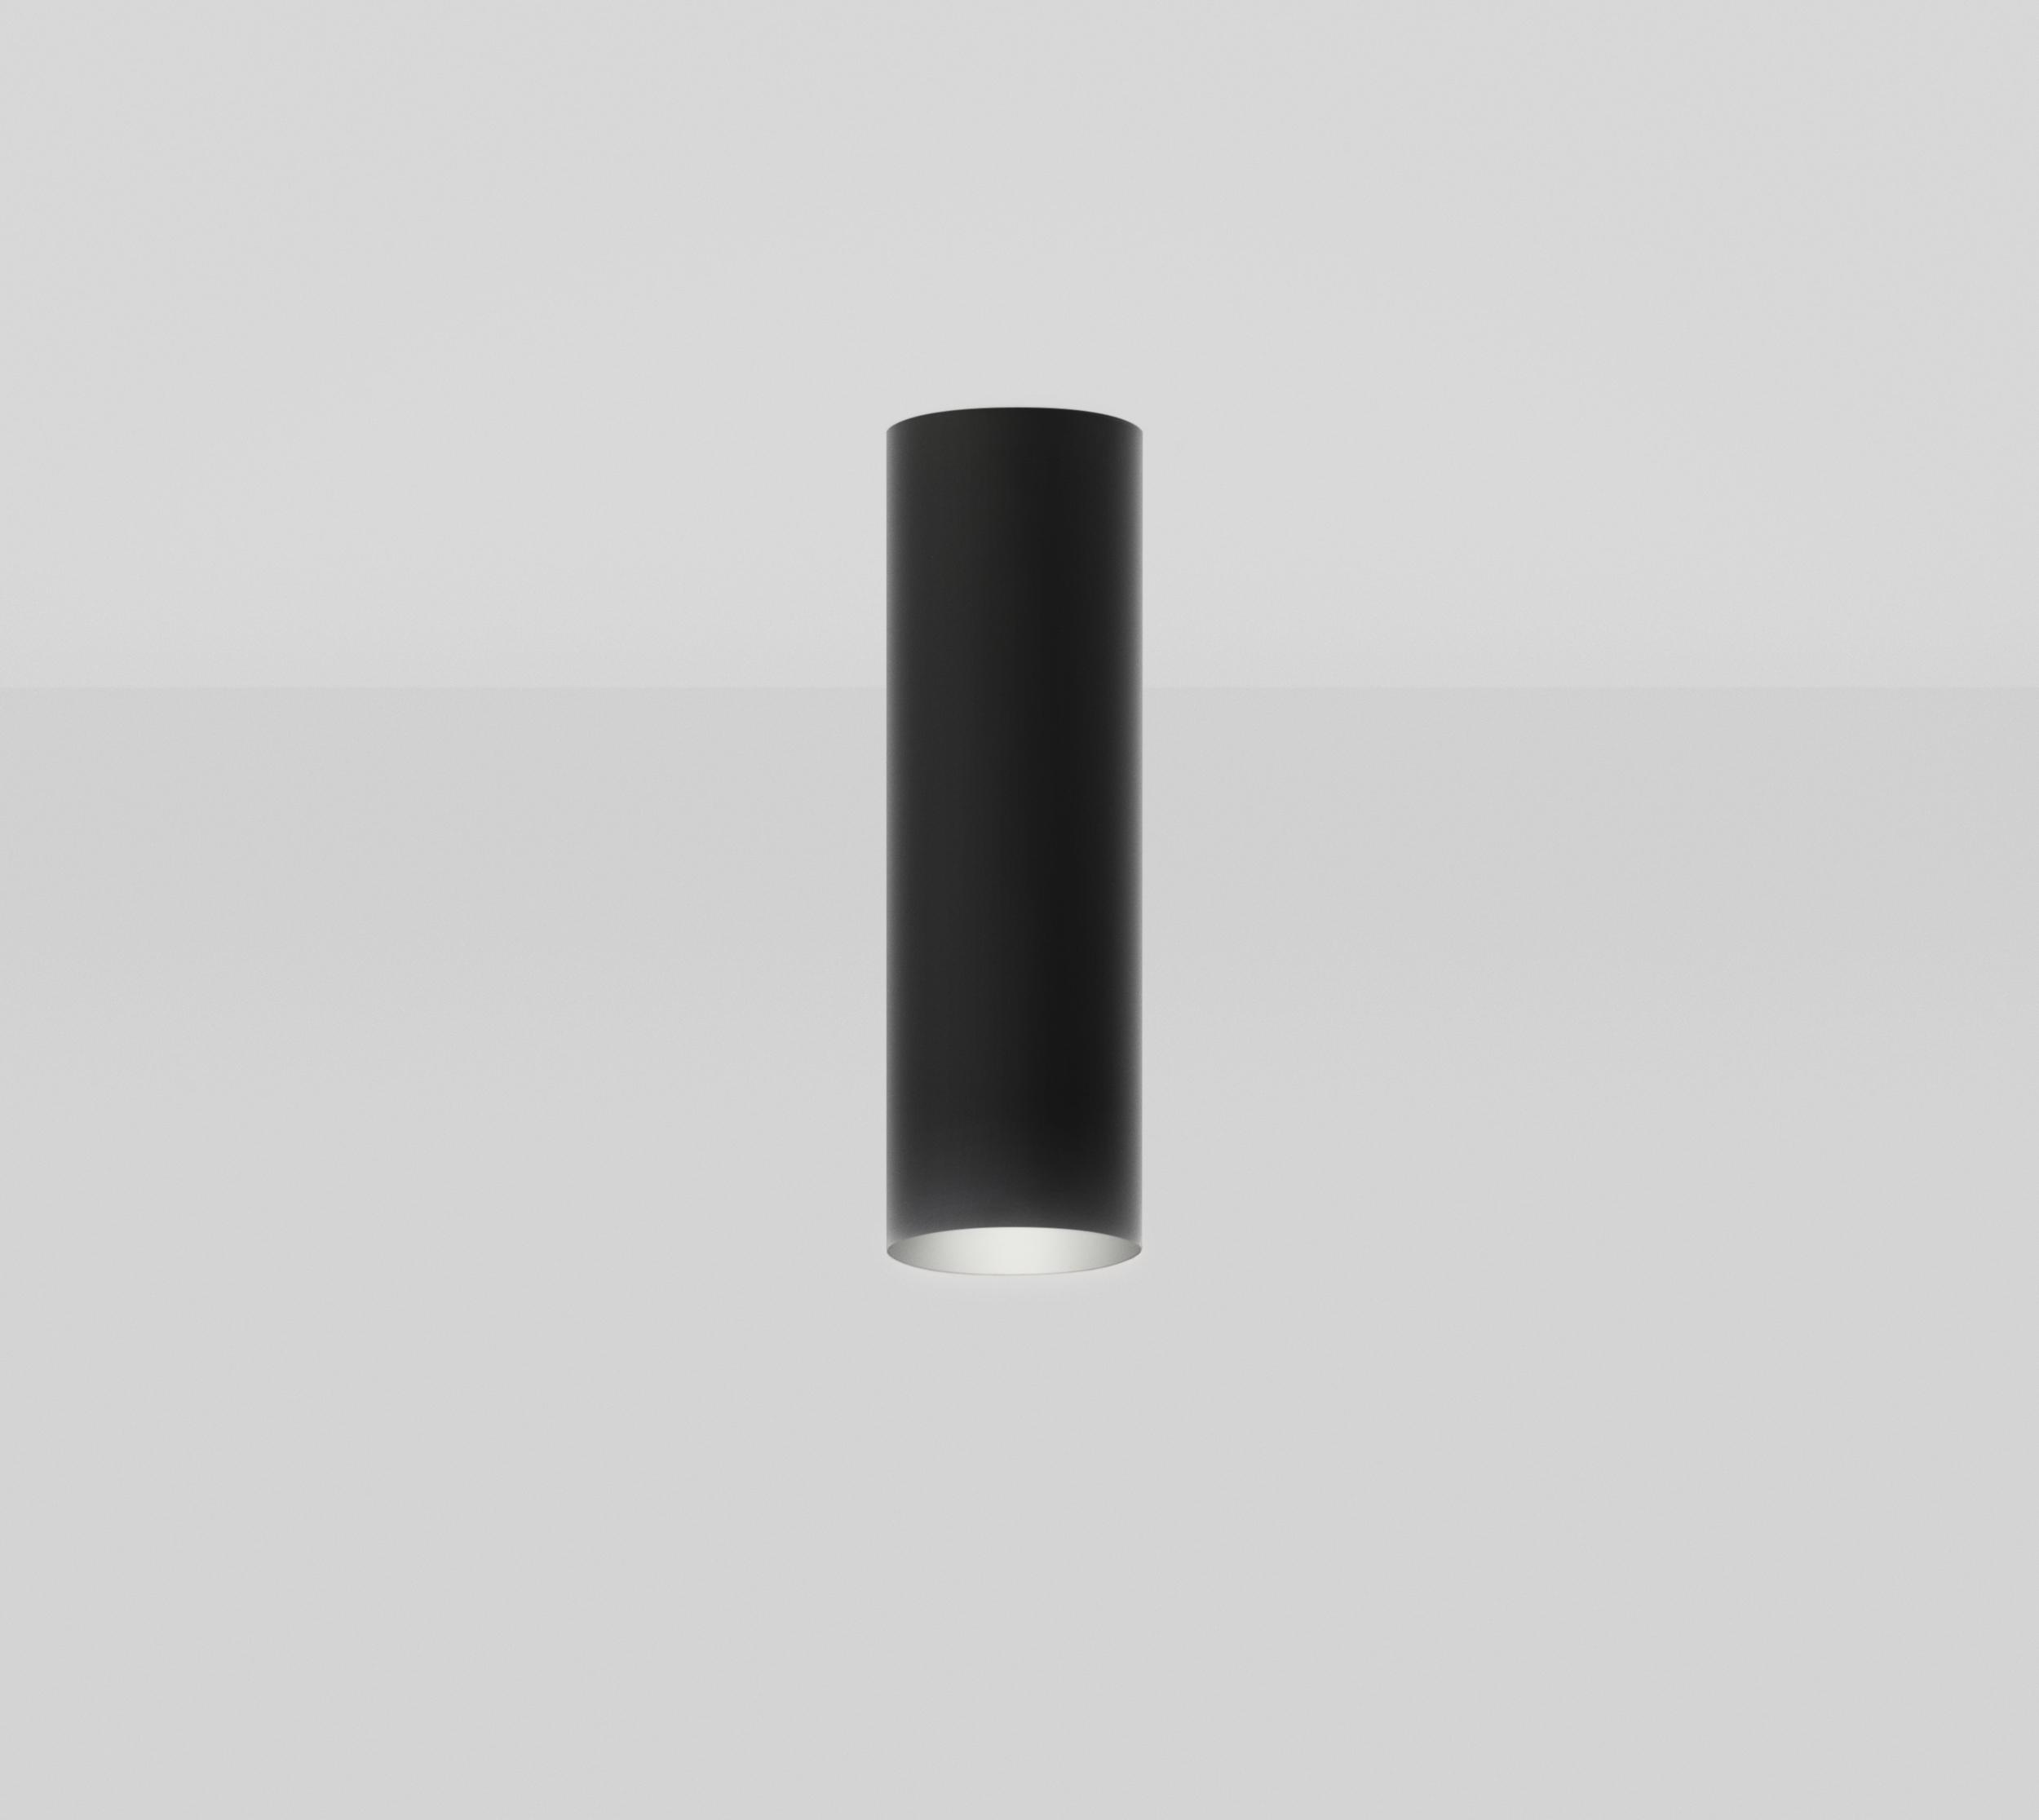 ISM_Can 100_Flat Black.jpg